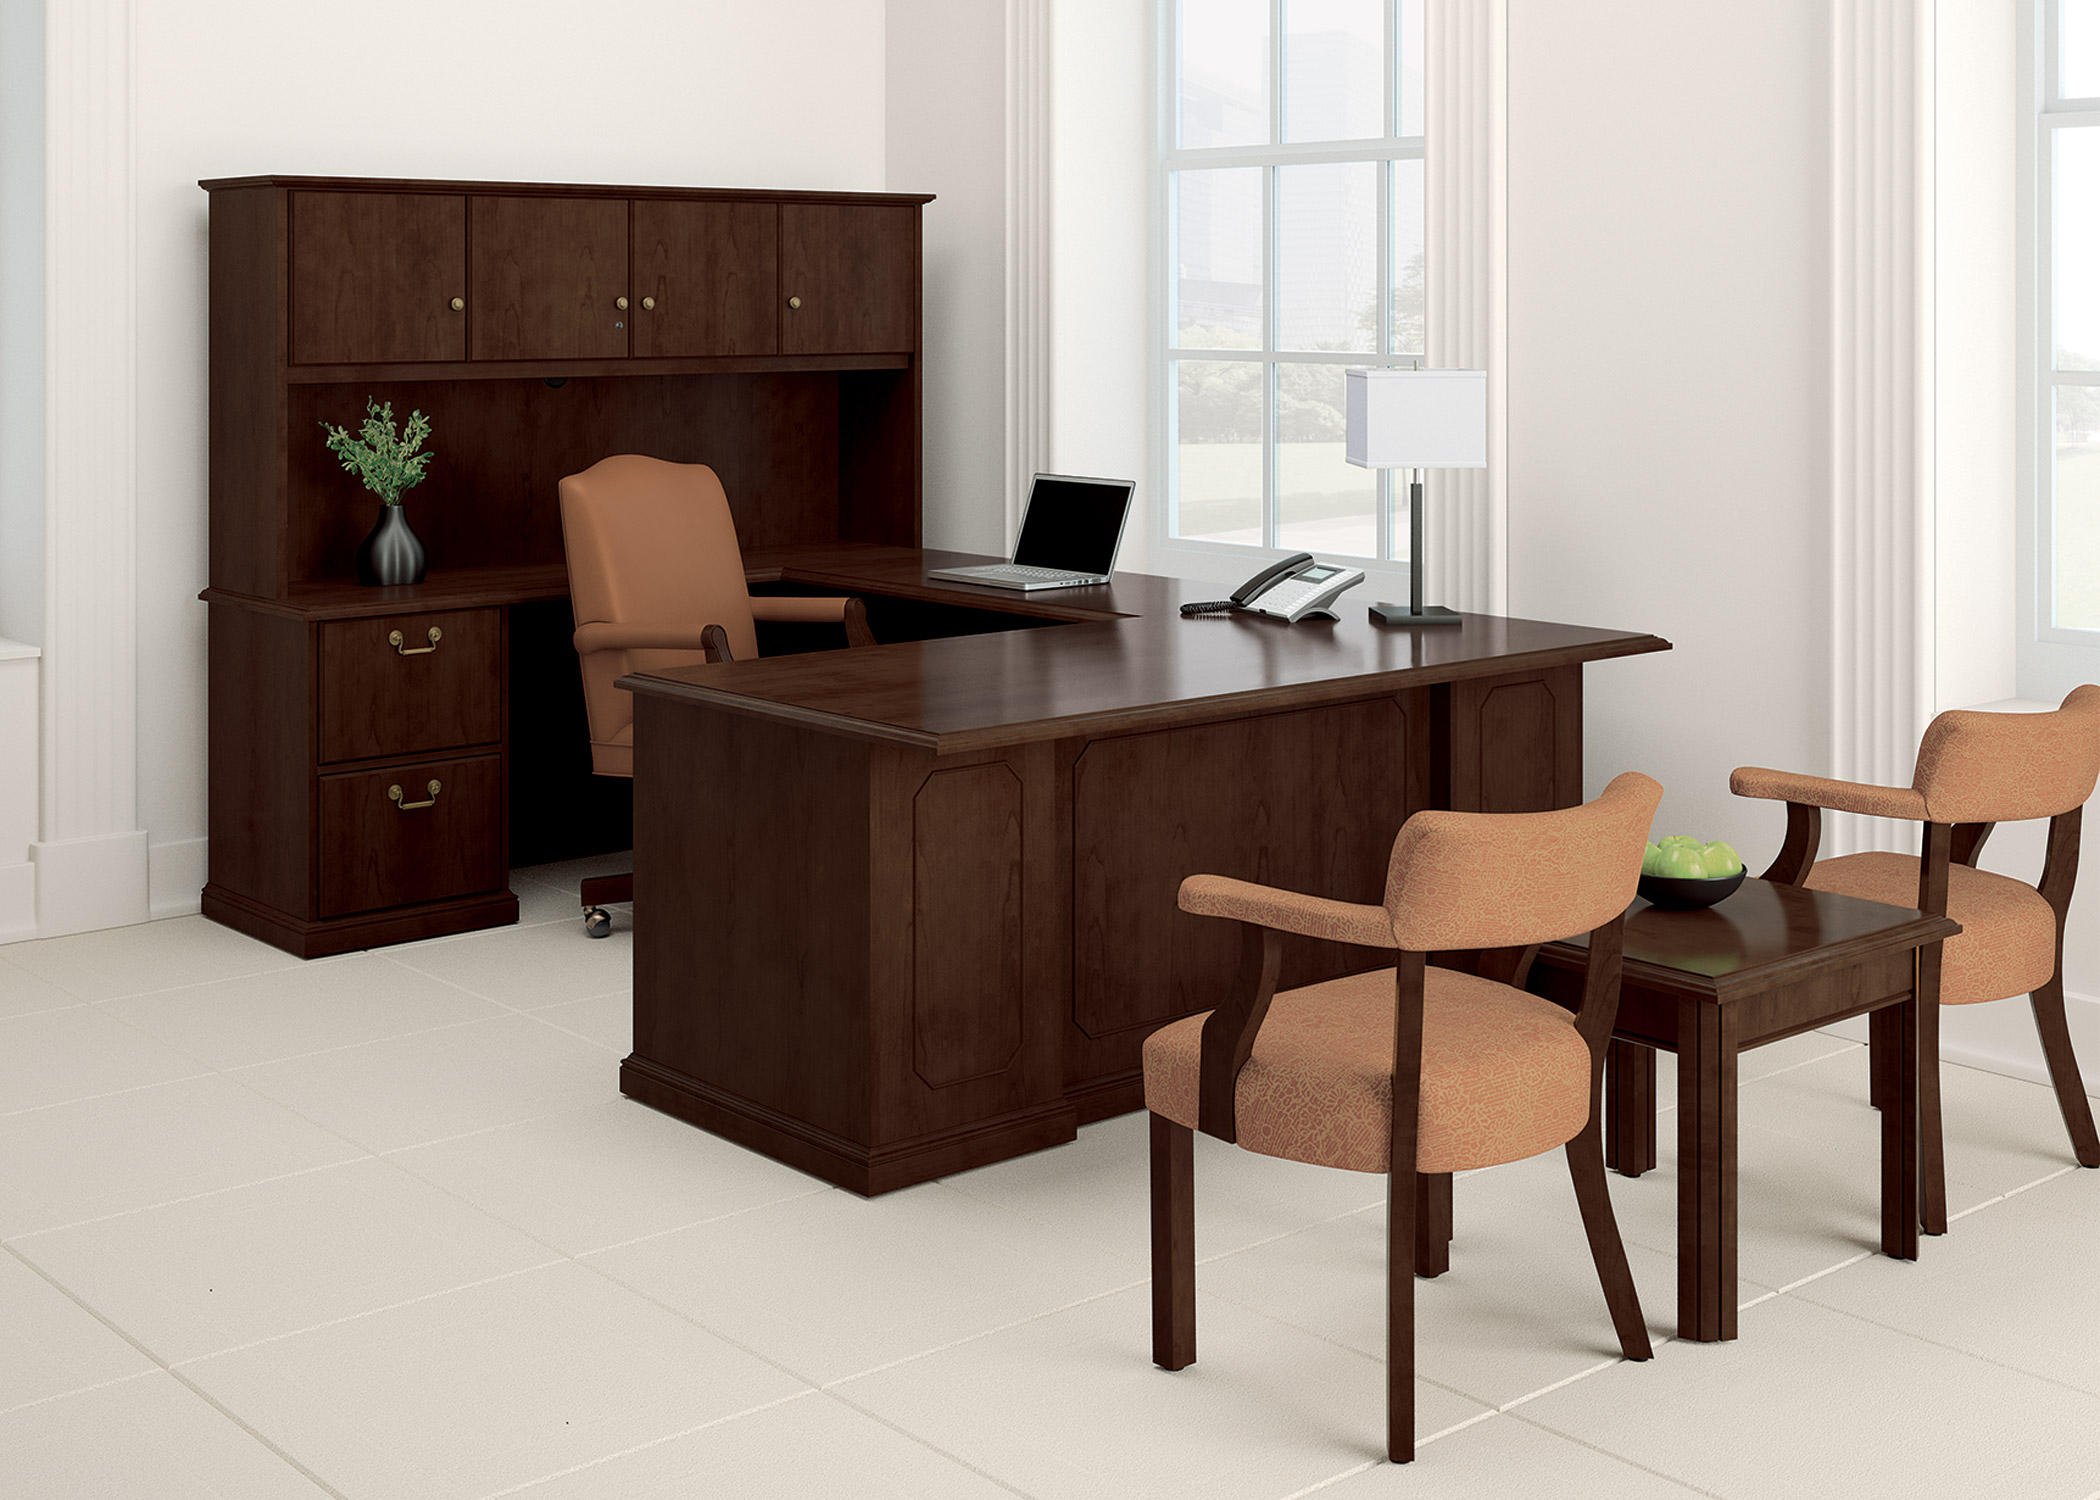 Office Furniture 5000 W Roosevelt